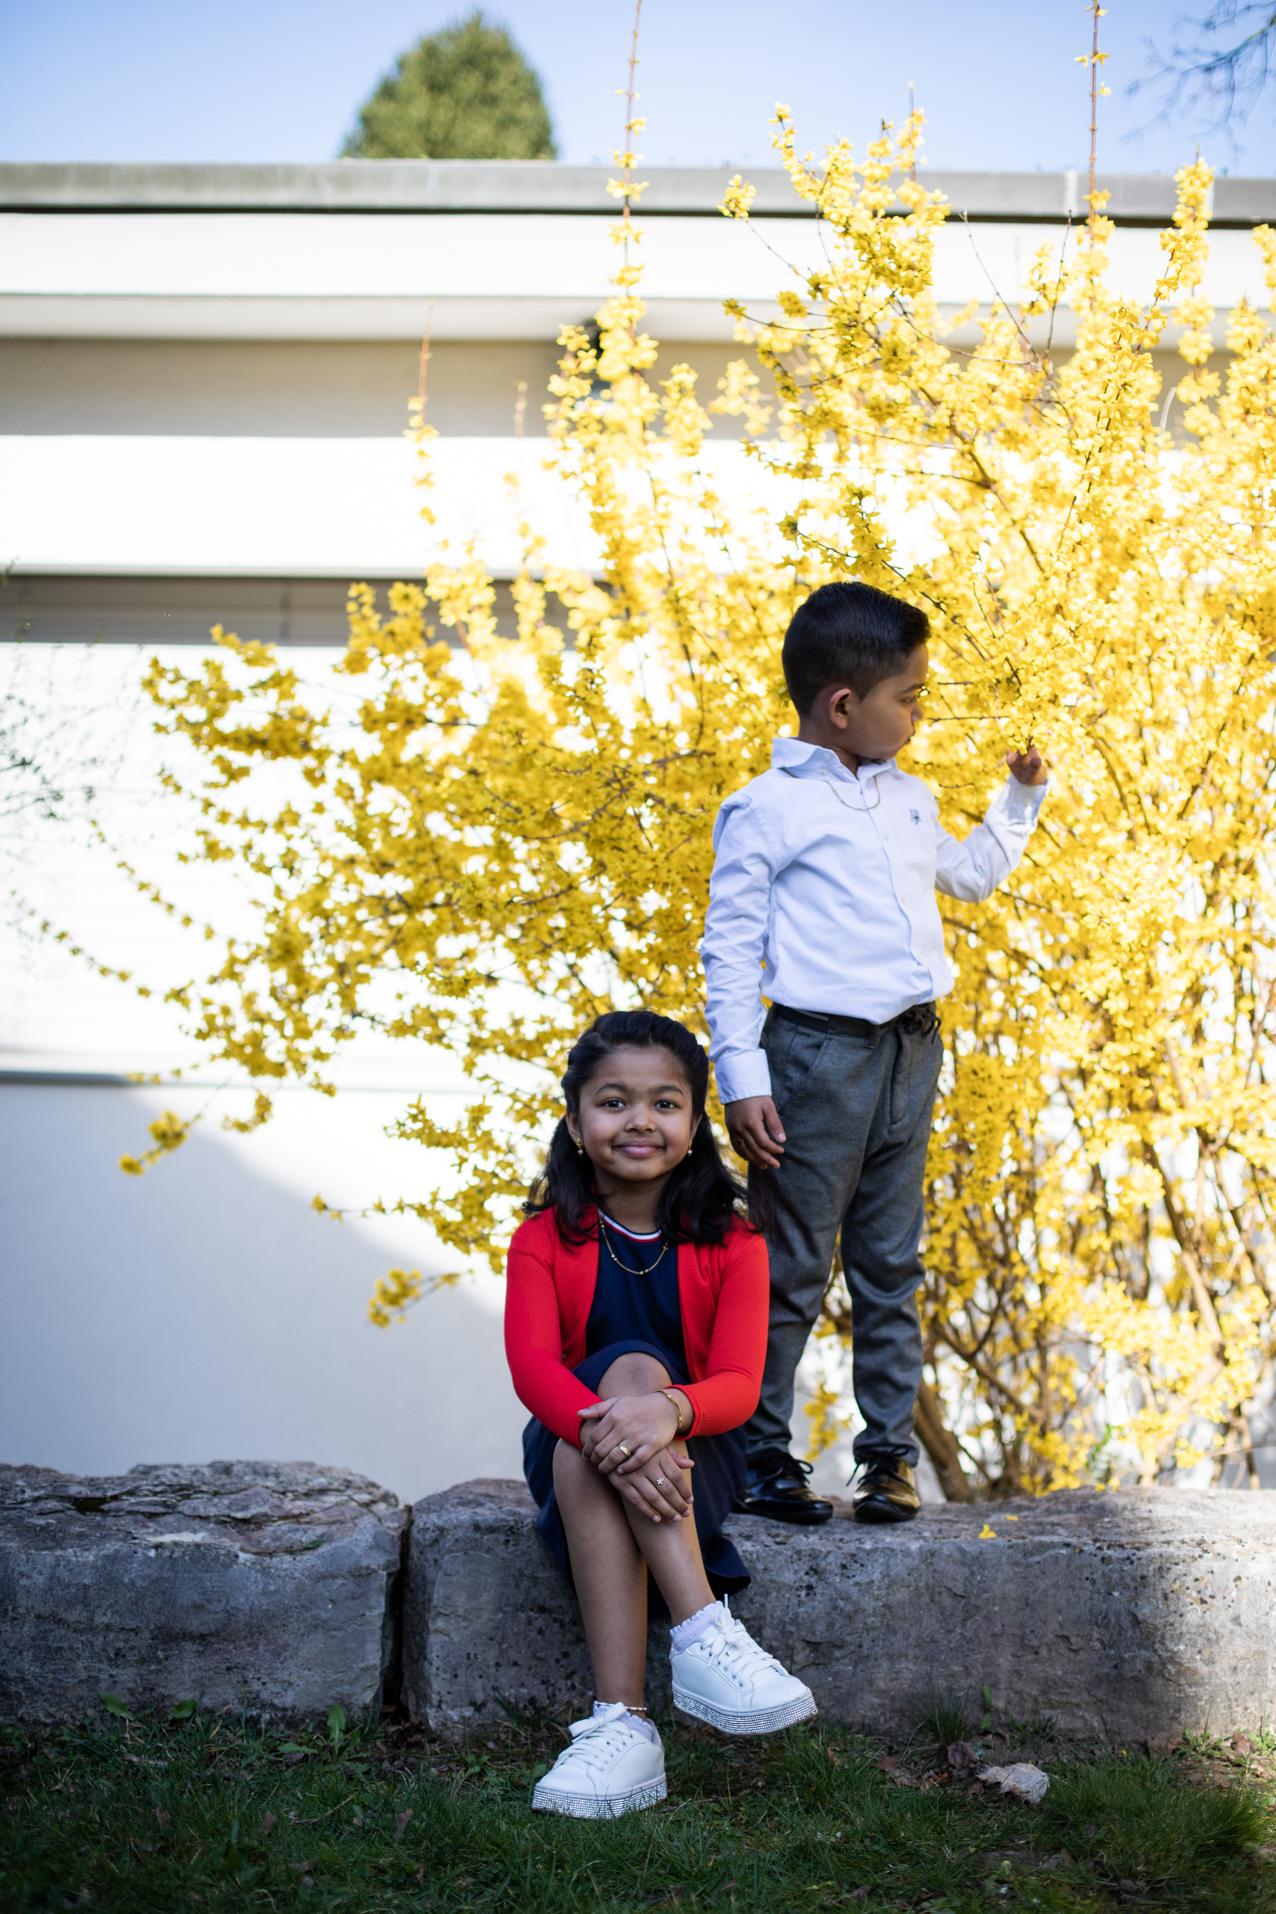 Aishu Reshmi und Bryan Ramesh, Siedlung Triemli